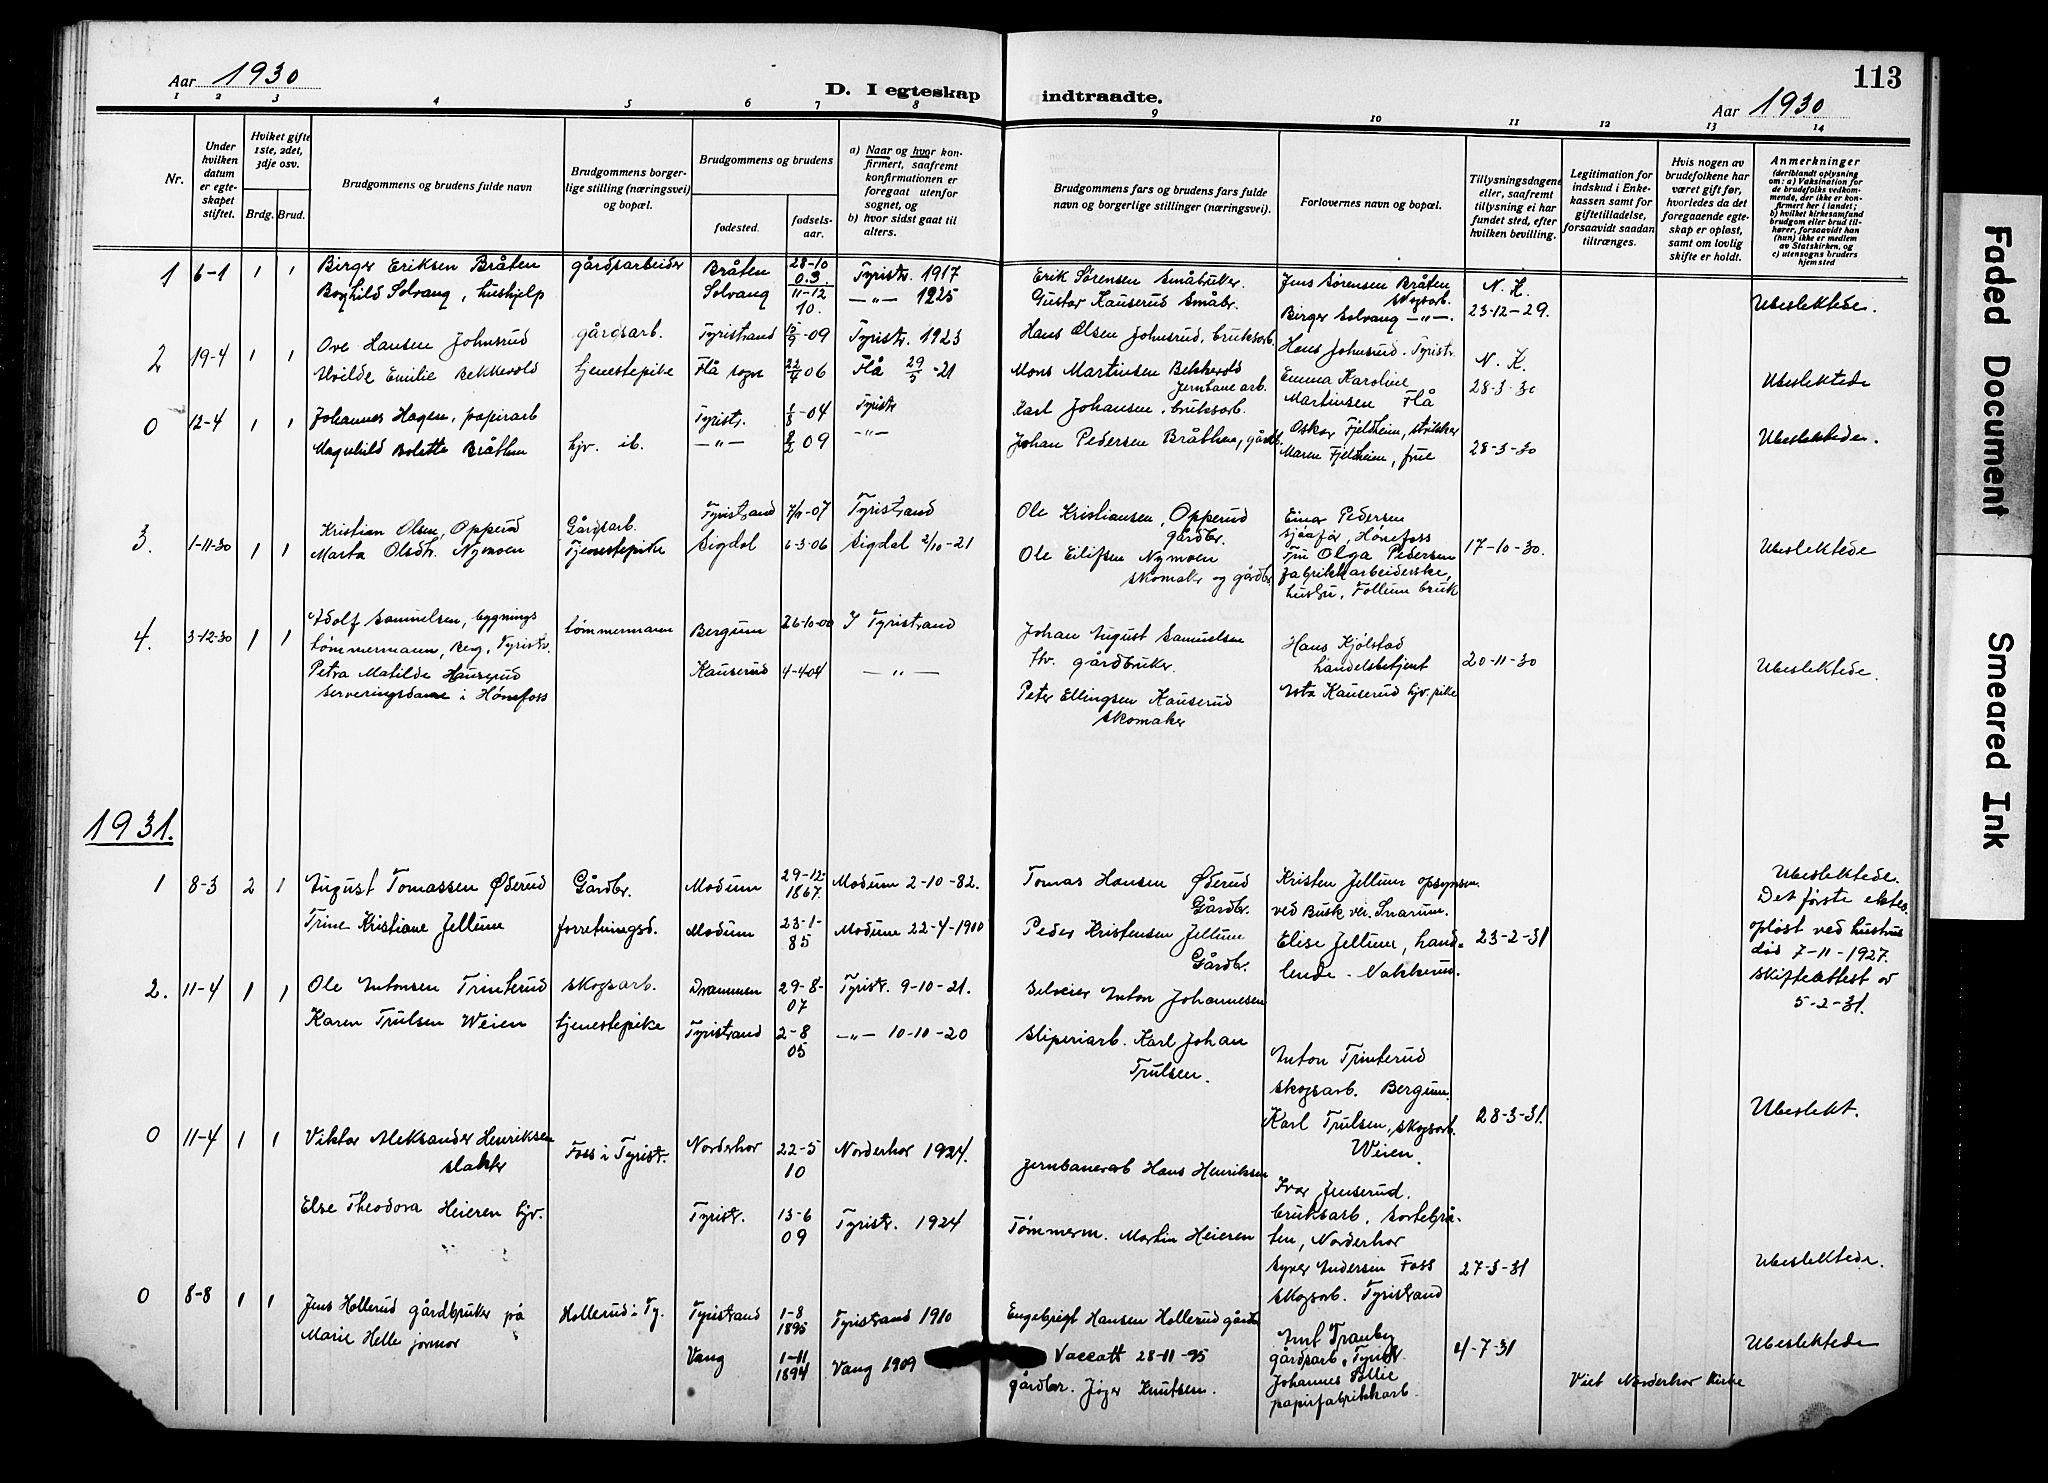 SAKO, Hole kirkebøker, G/Gb/L0005: Klokkerbok nr. II 5, 1915-1932, s. 113